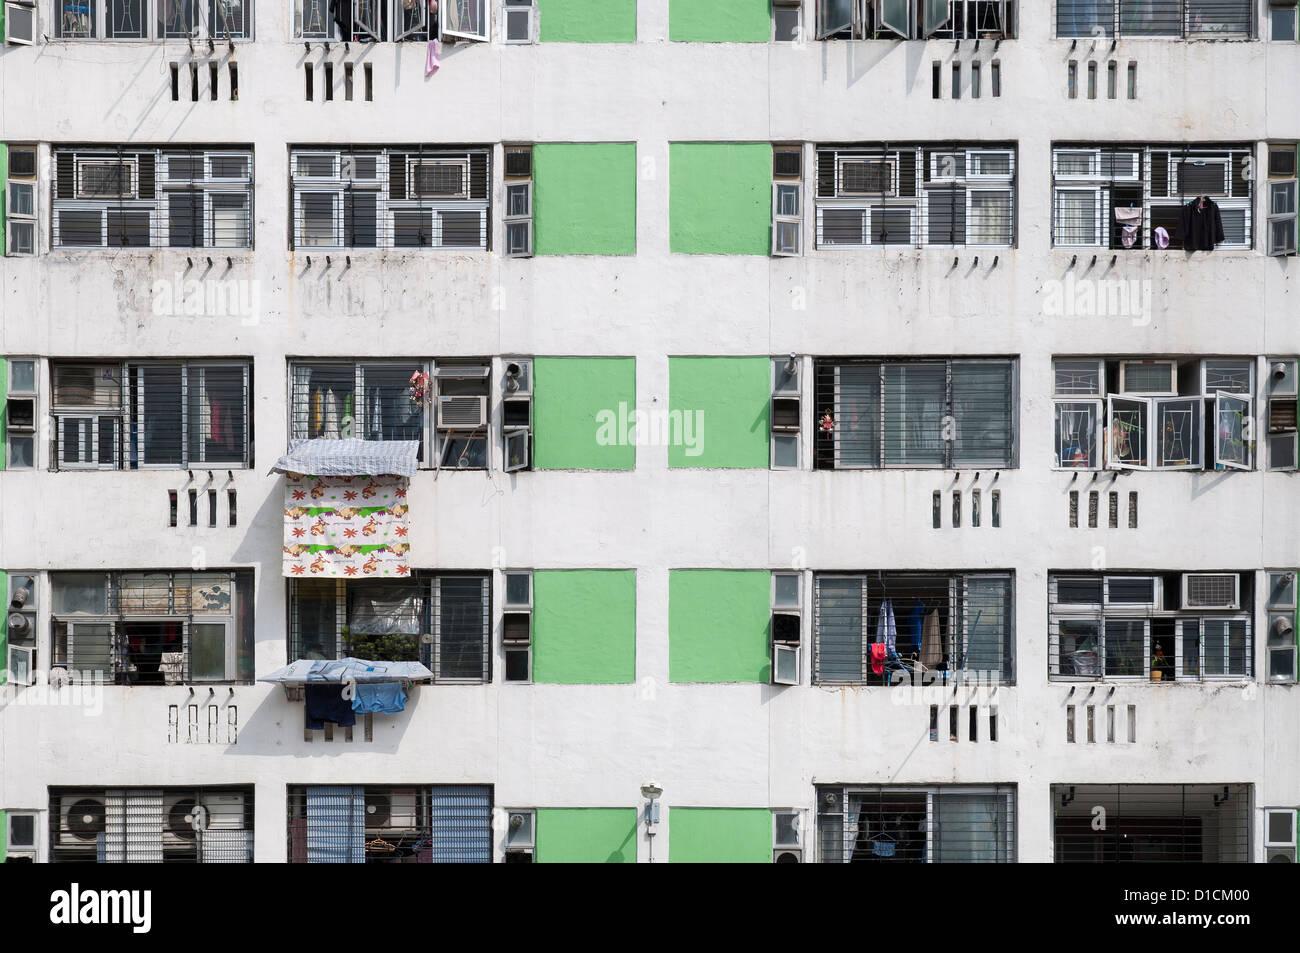 High density public housing on the Lek Yuen Estate, Sha Tin, Hong Kong - Stock Image